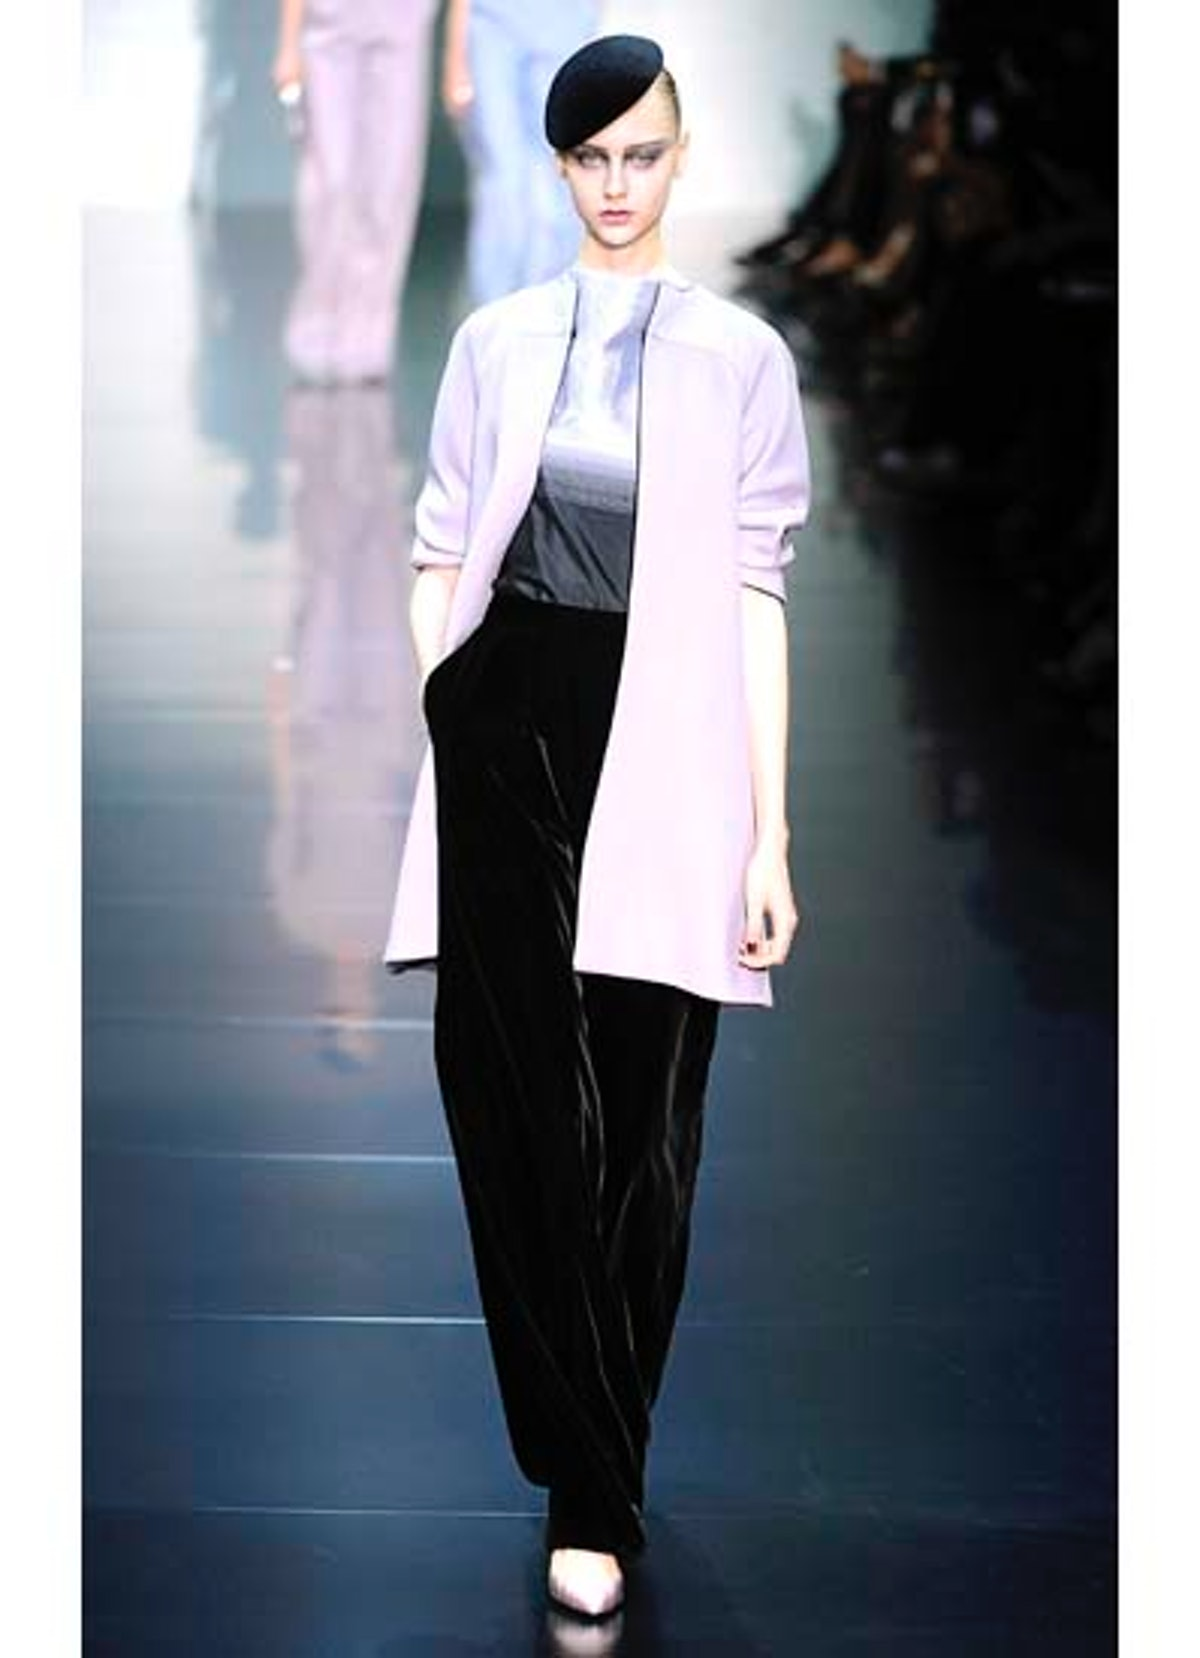 fass-giorgio-armani-couture-2012-runway-03-v.jpg